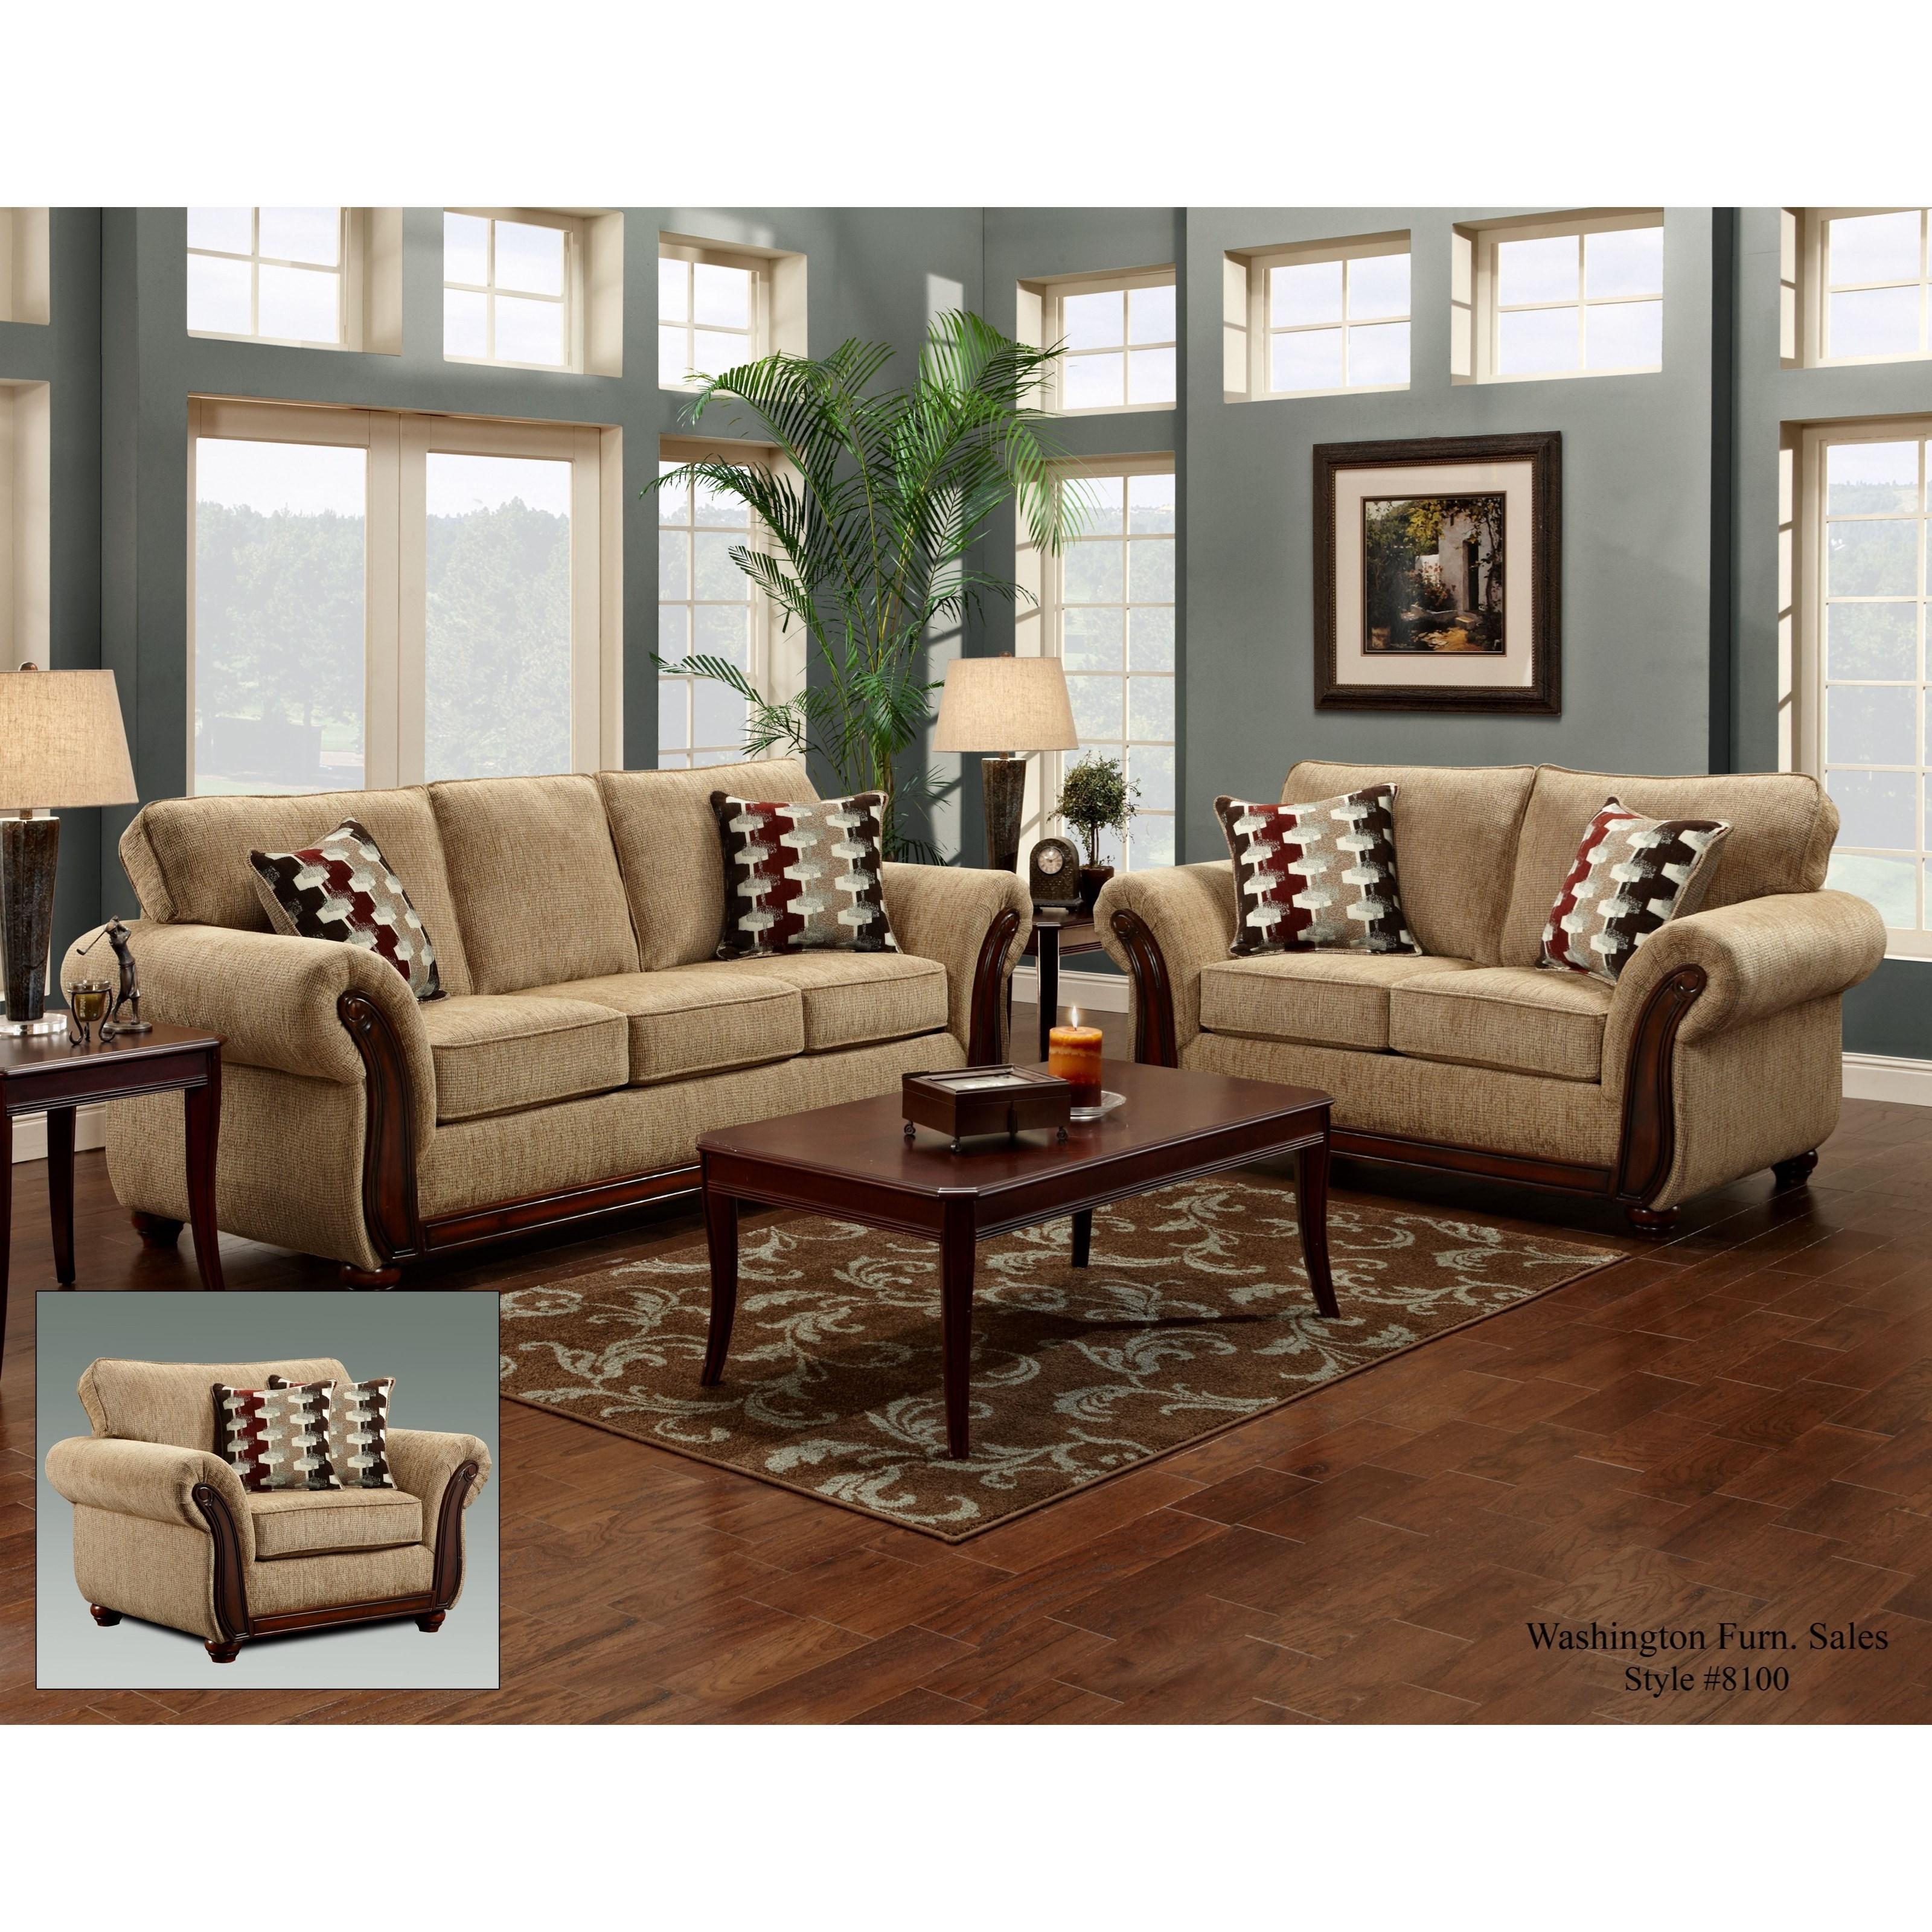 8100 Washington Stationary Living Room Group by Washington Furniture at Lynn's Furniture & Mattress